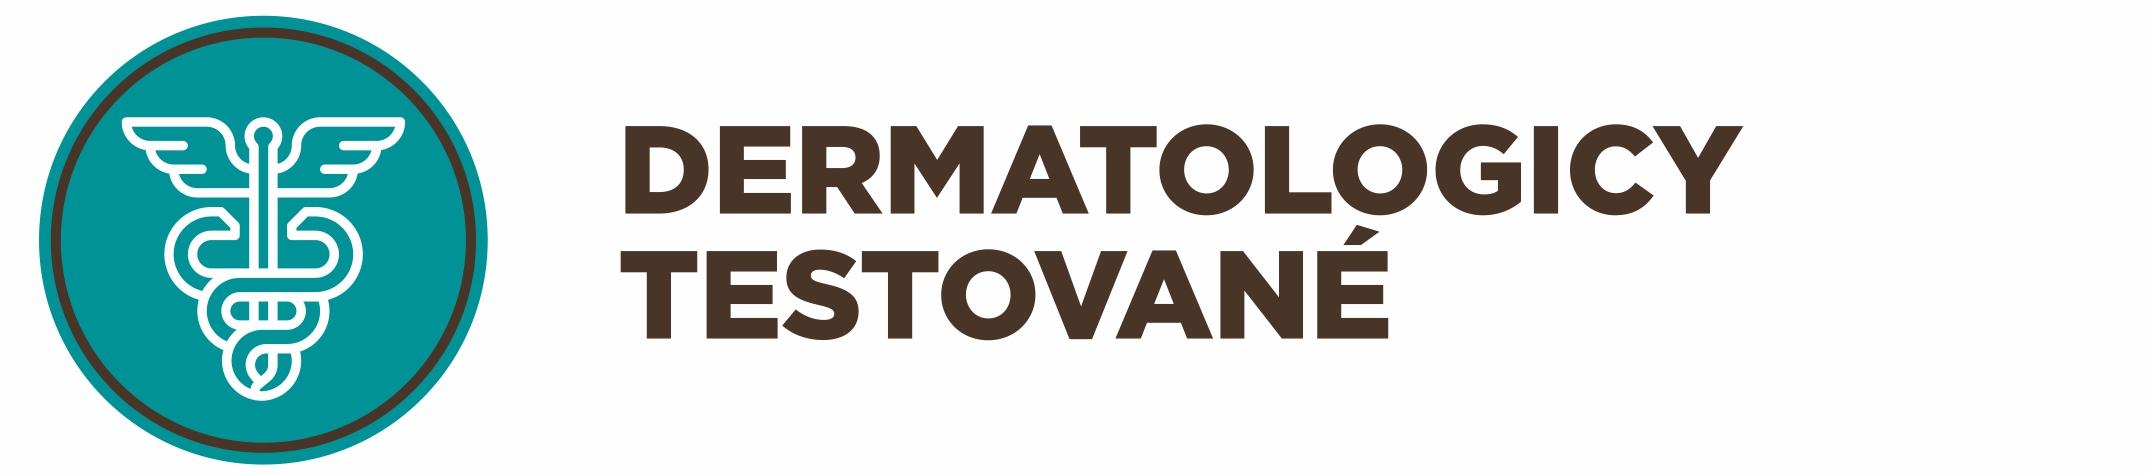 label_dermatologicky_testovane